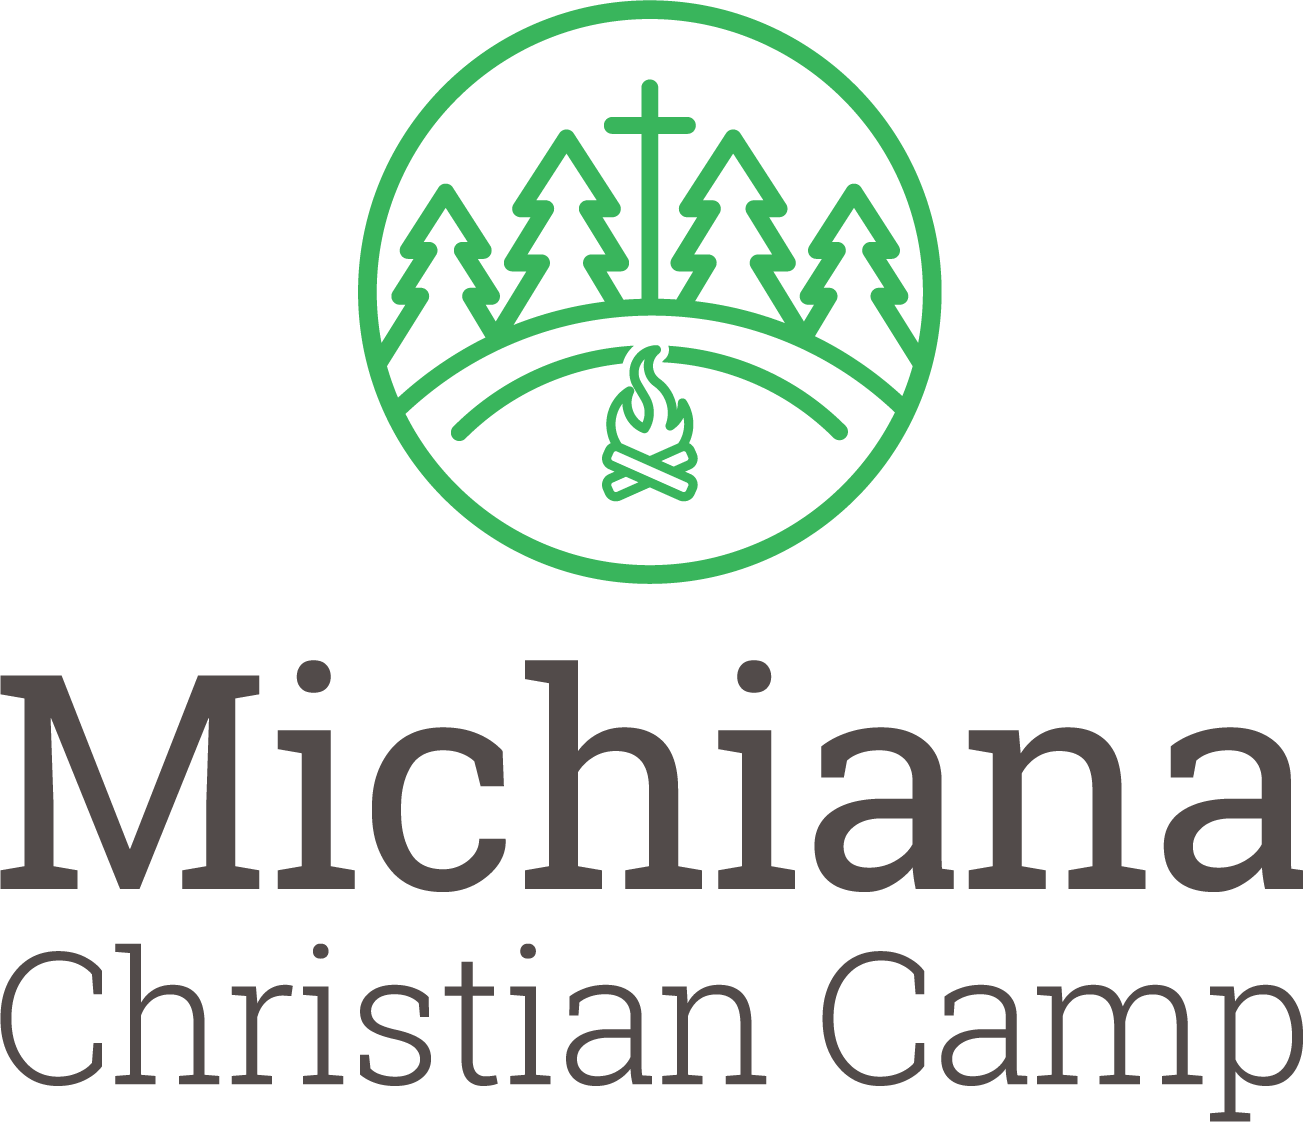 michiana-christian-camp-vertical.png